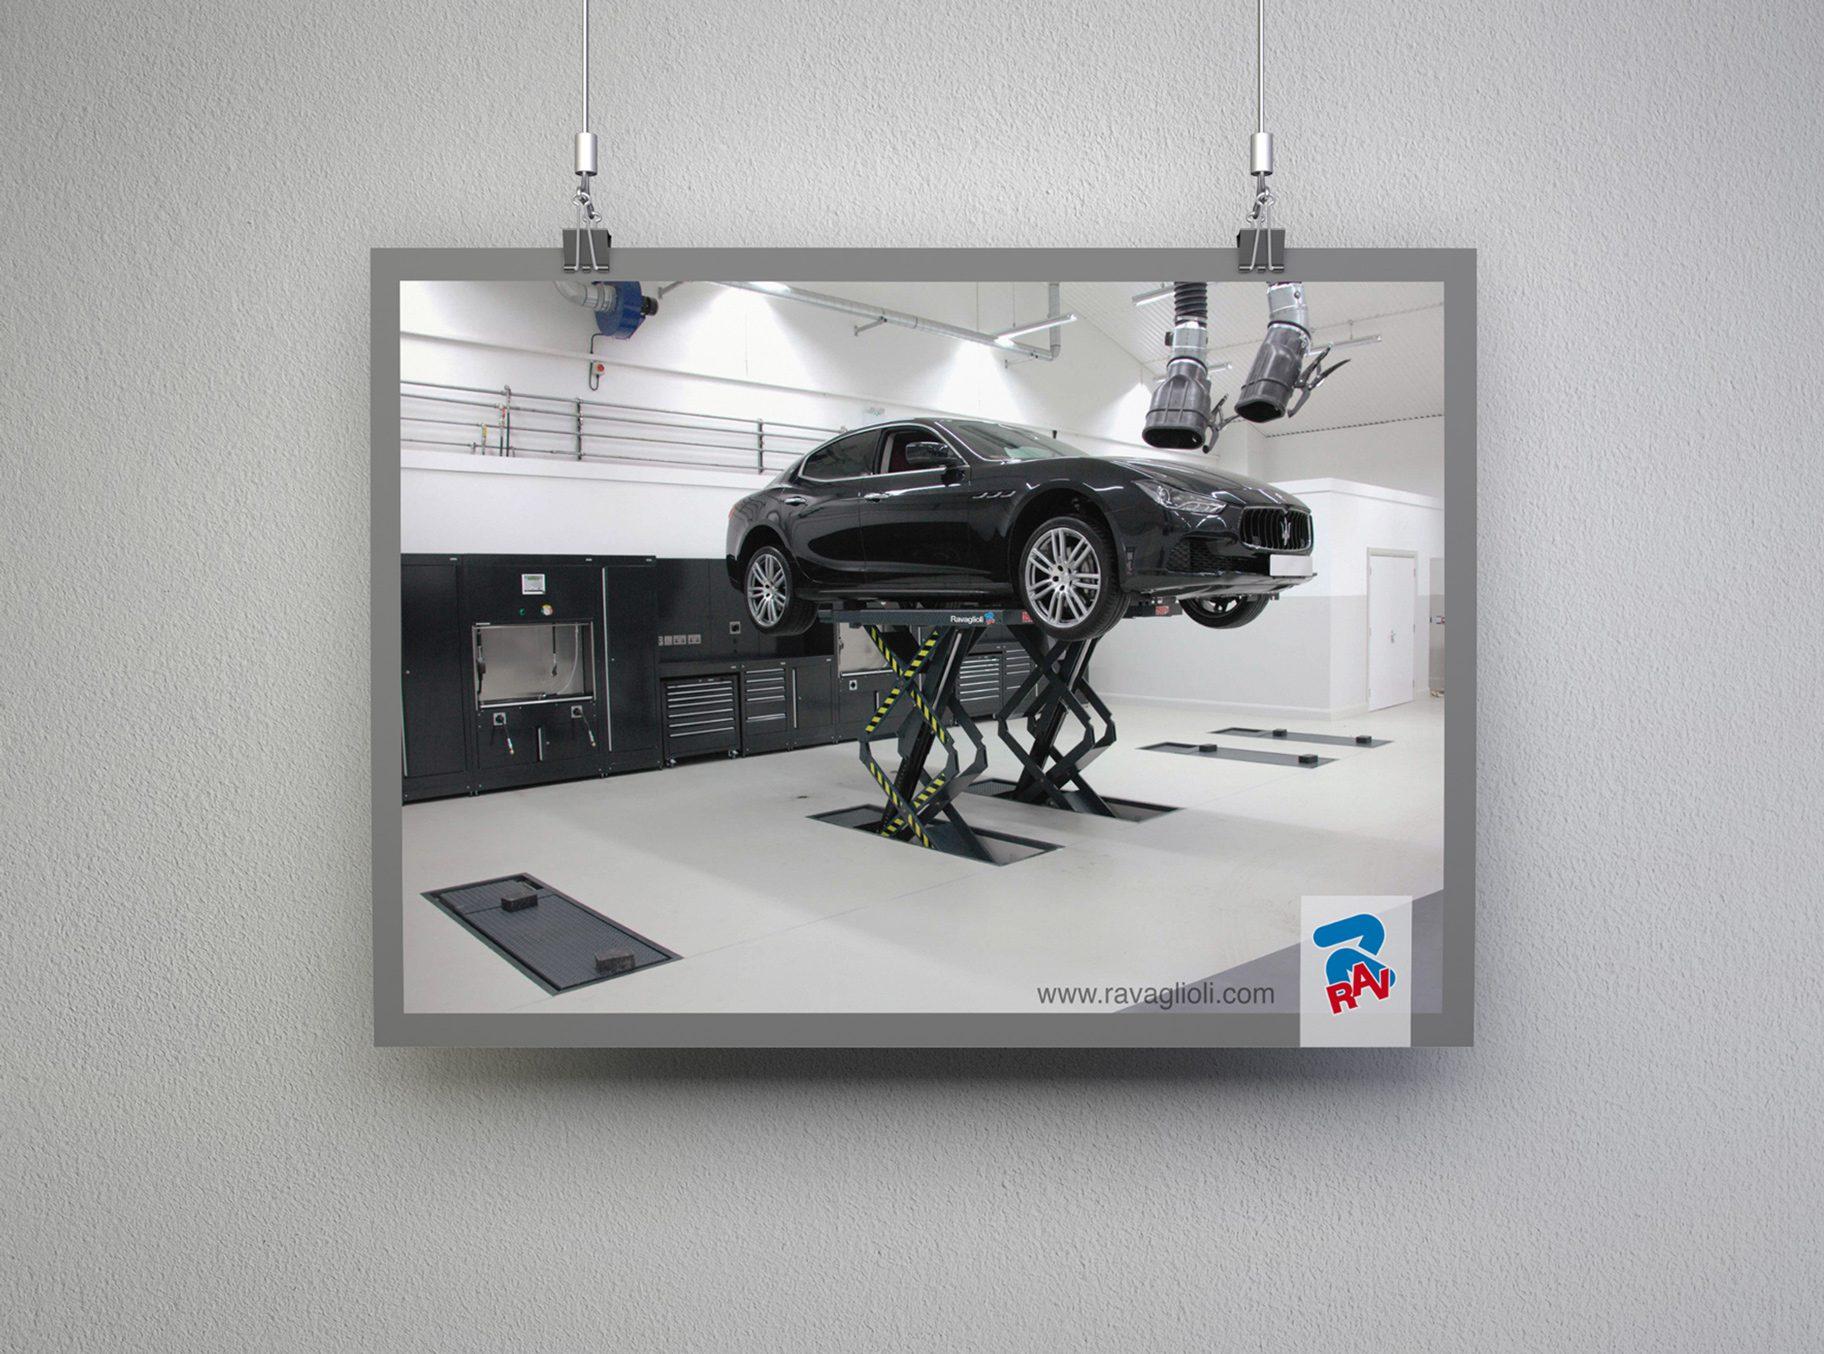 Ravaglioli-poster-03